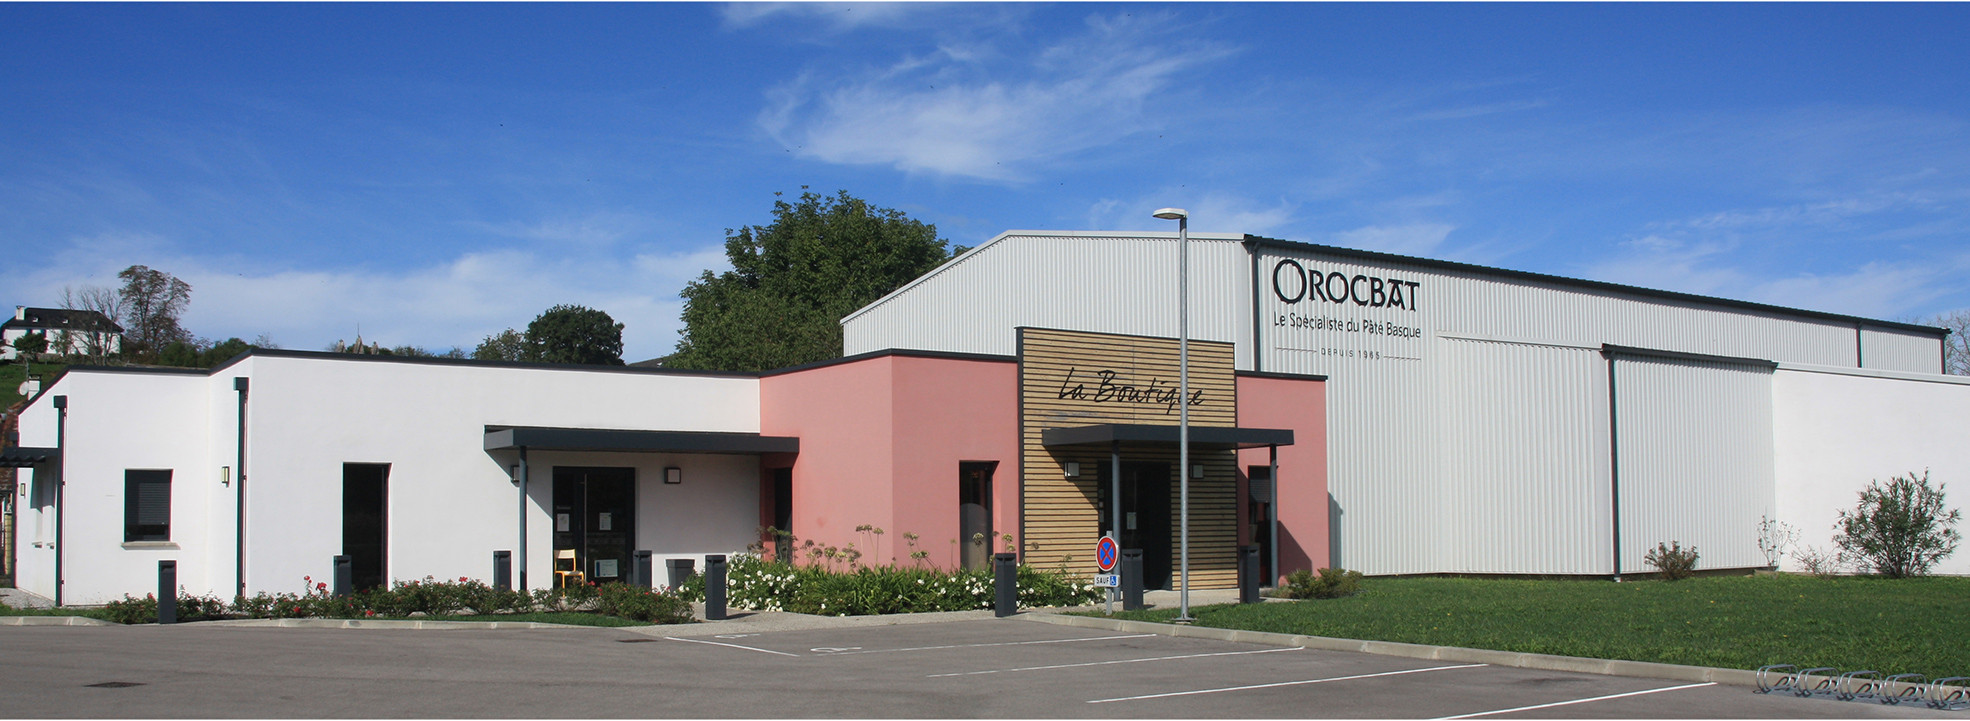 Bâtiment et entrepôt OROCBAT